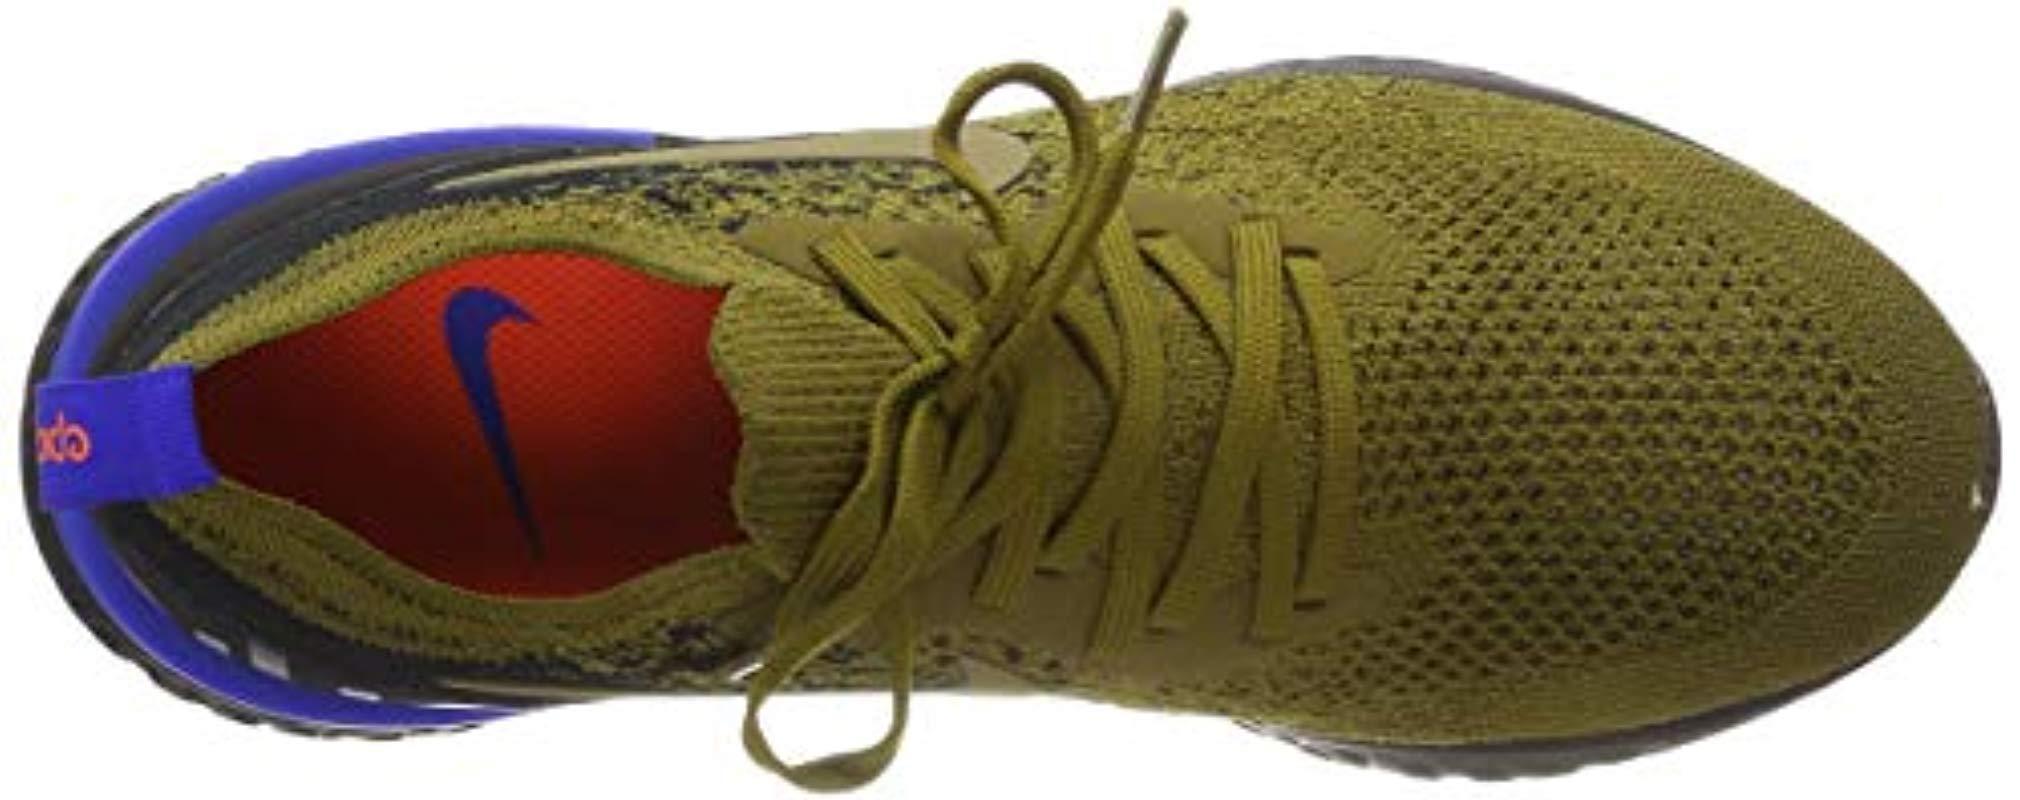 1a0f11ebabdf Nike Herren Laufschuh Epic React Flyknit Training Shoes in Green for ...